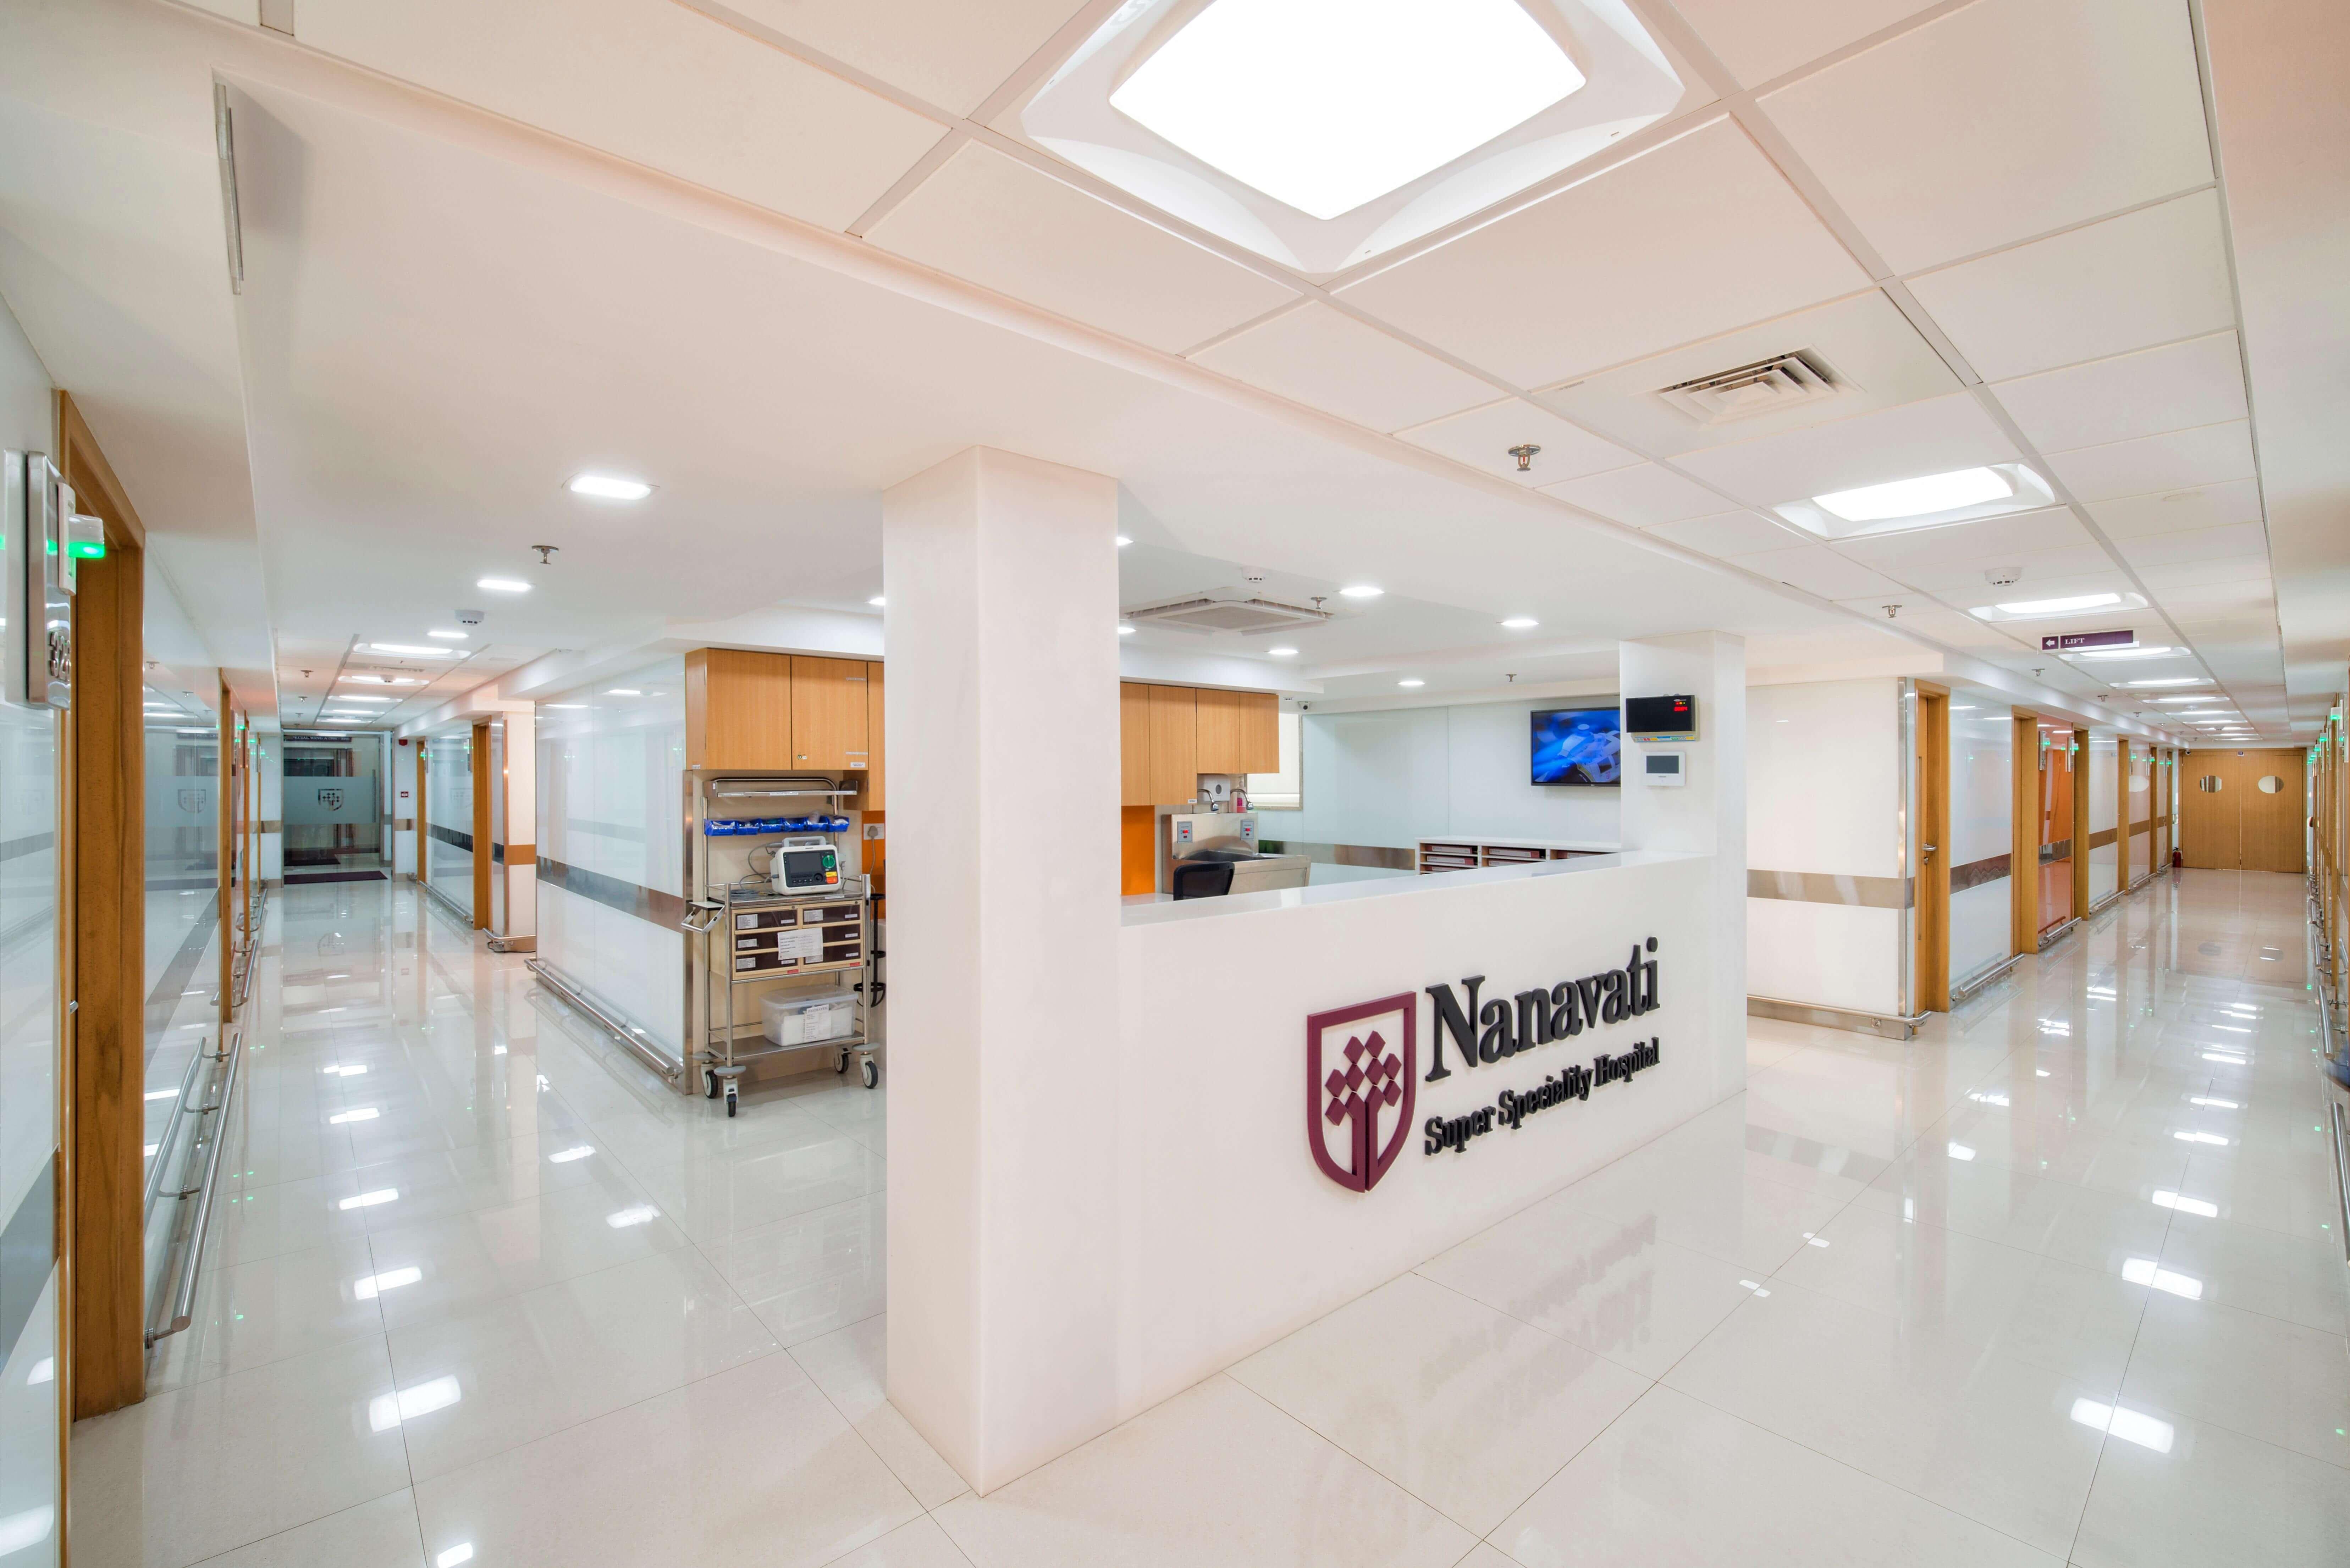 Nanavati Hospital